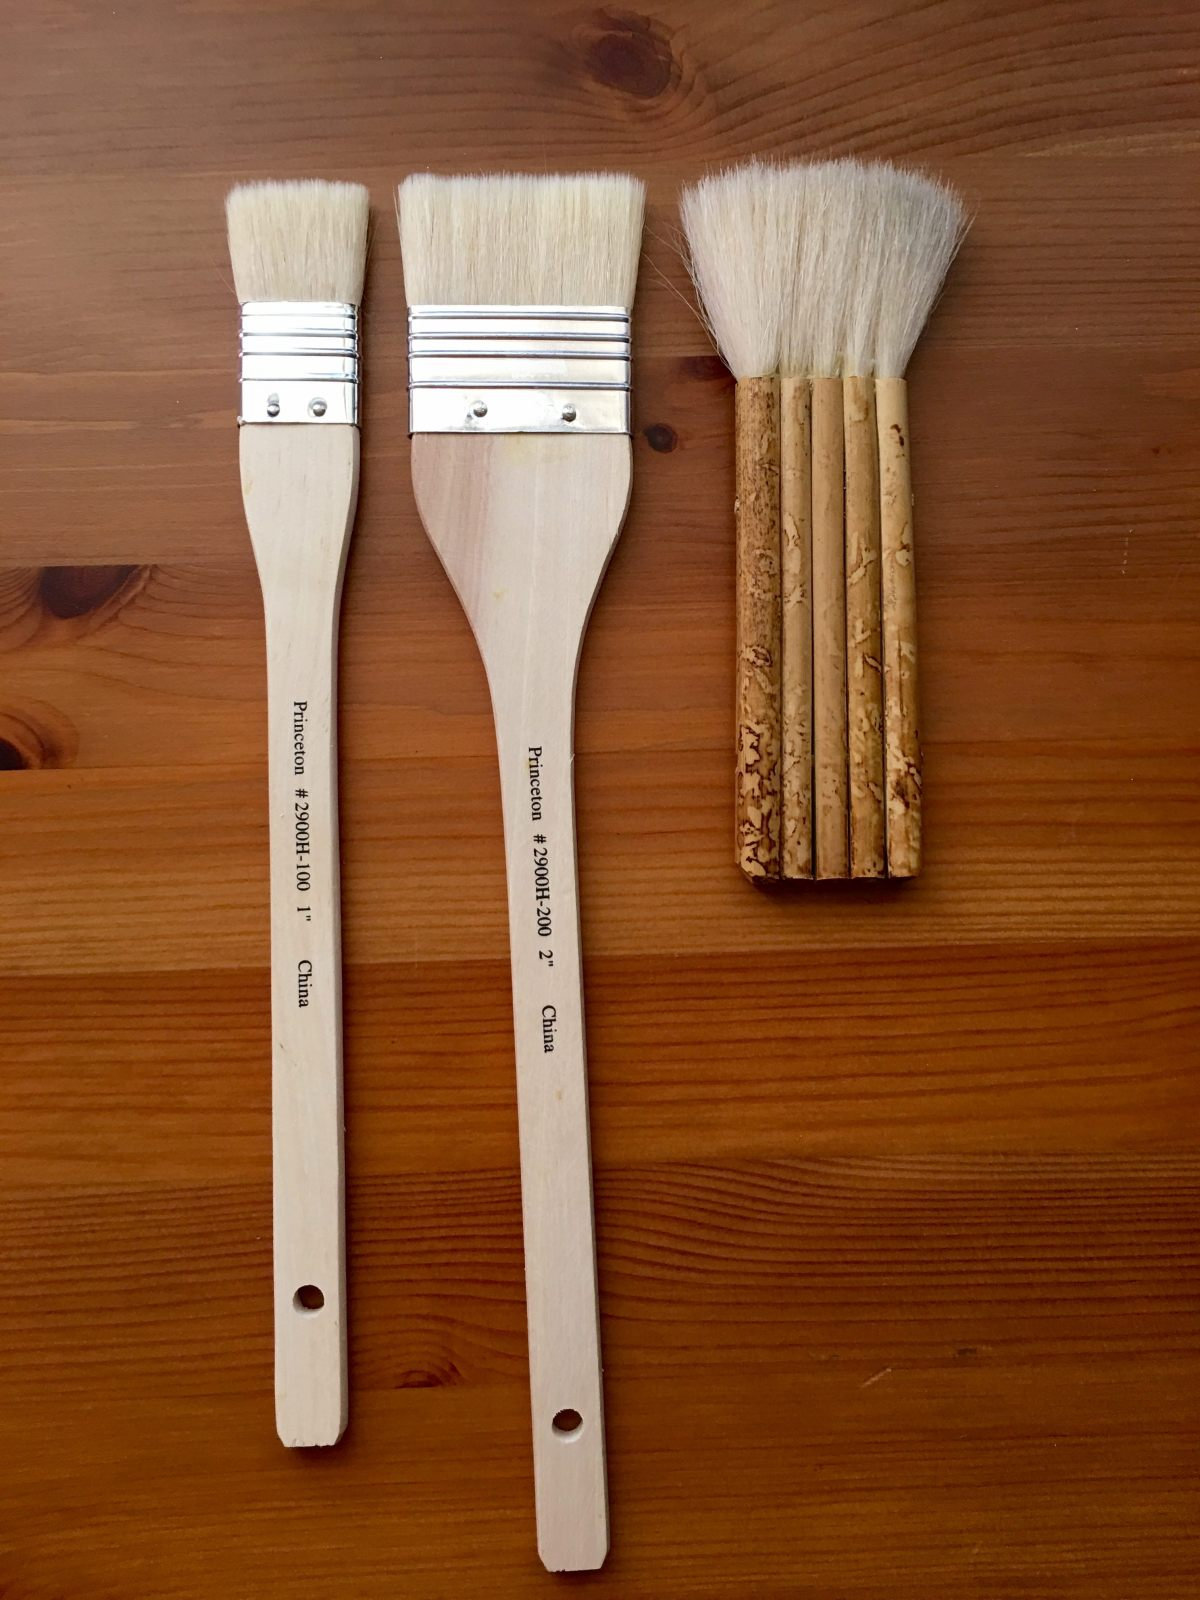 hake brushes, goat hair